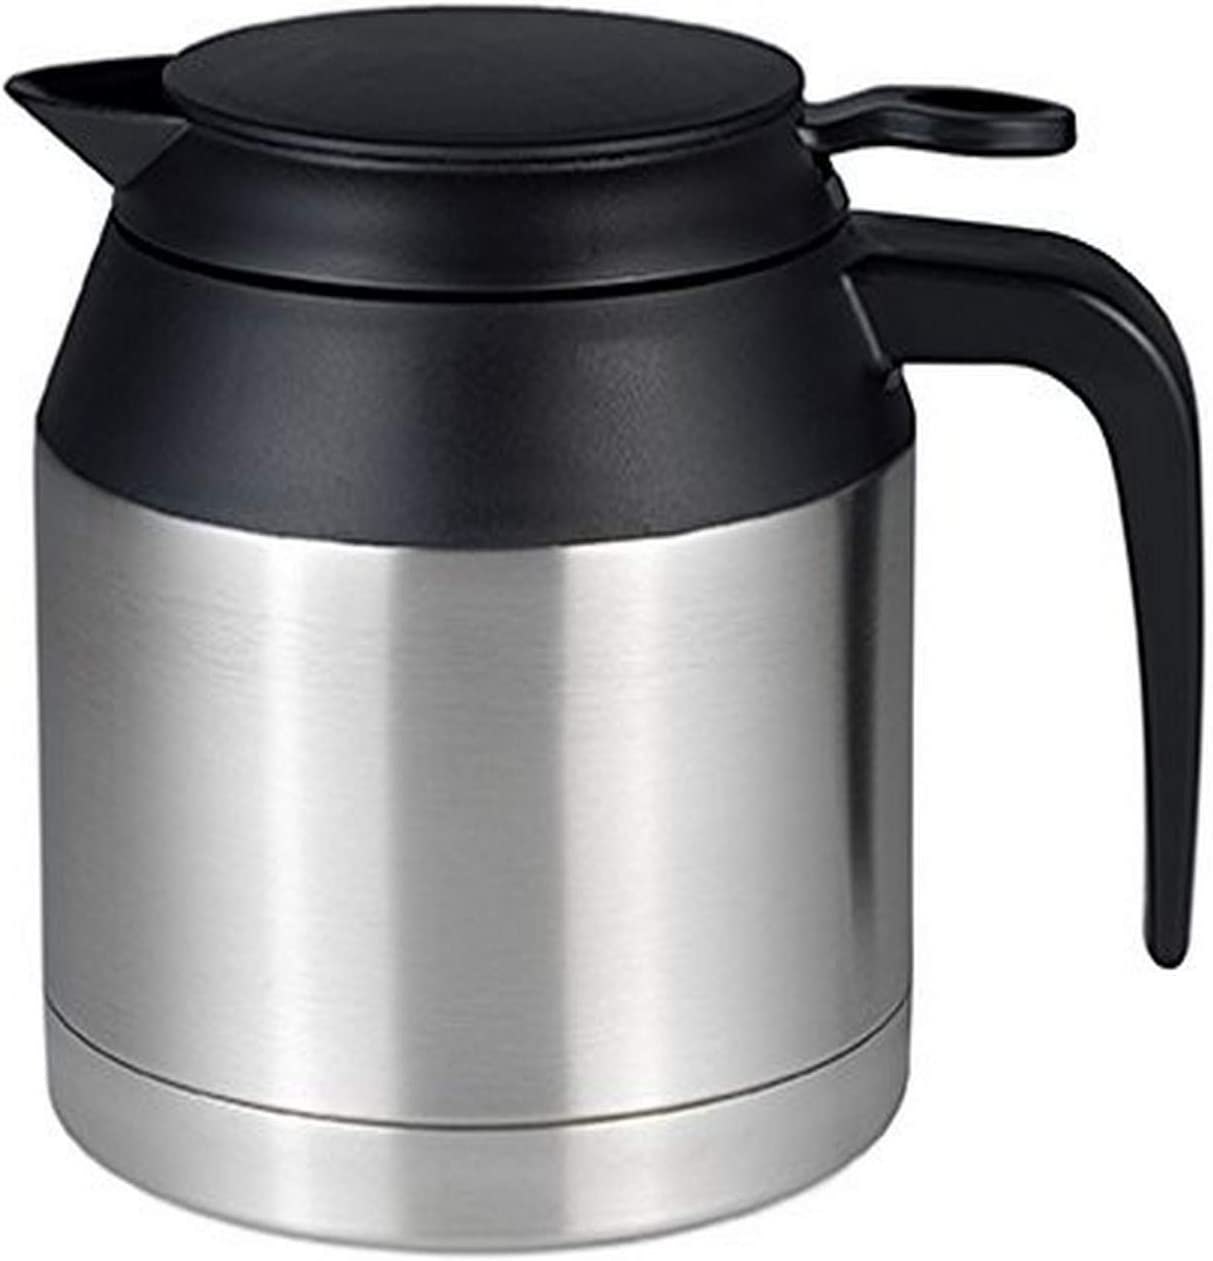 B071VK1XZ5 Bonavita BV1500RC01 5-cup Thermal Carafe, Silver/Black 61RBEcY2ThL